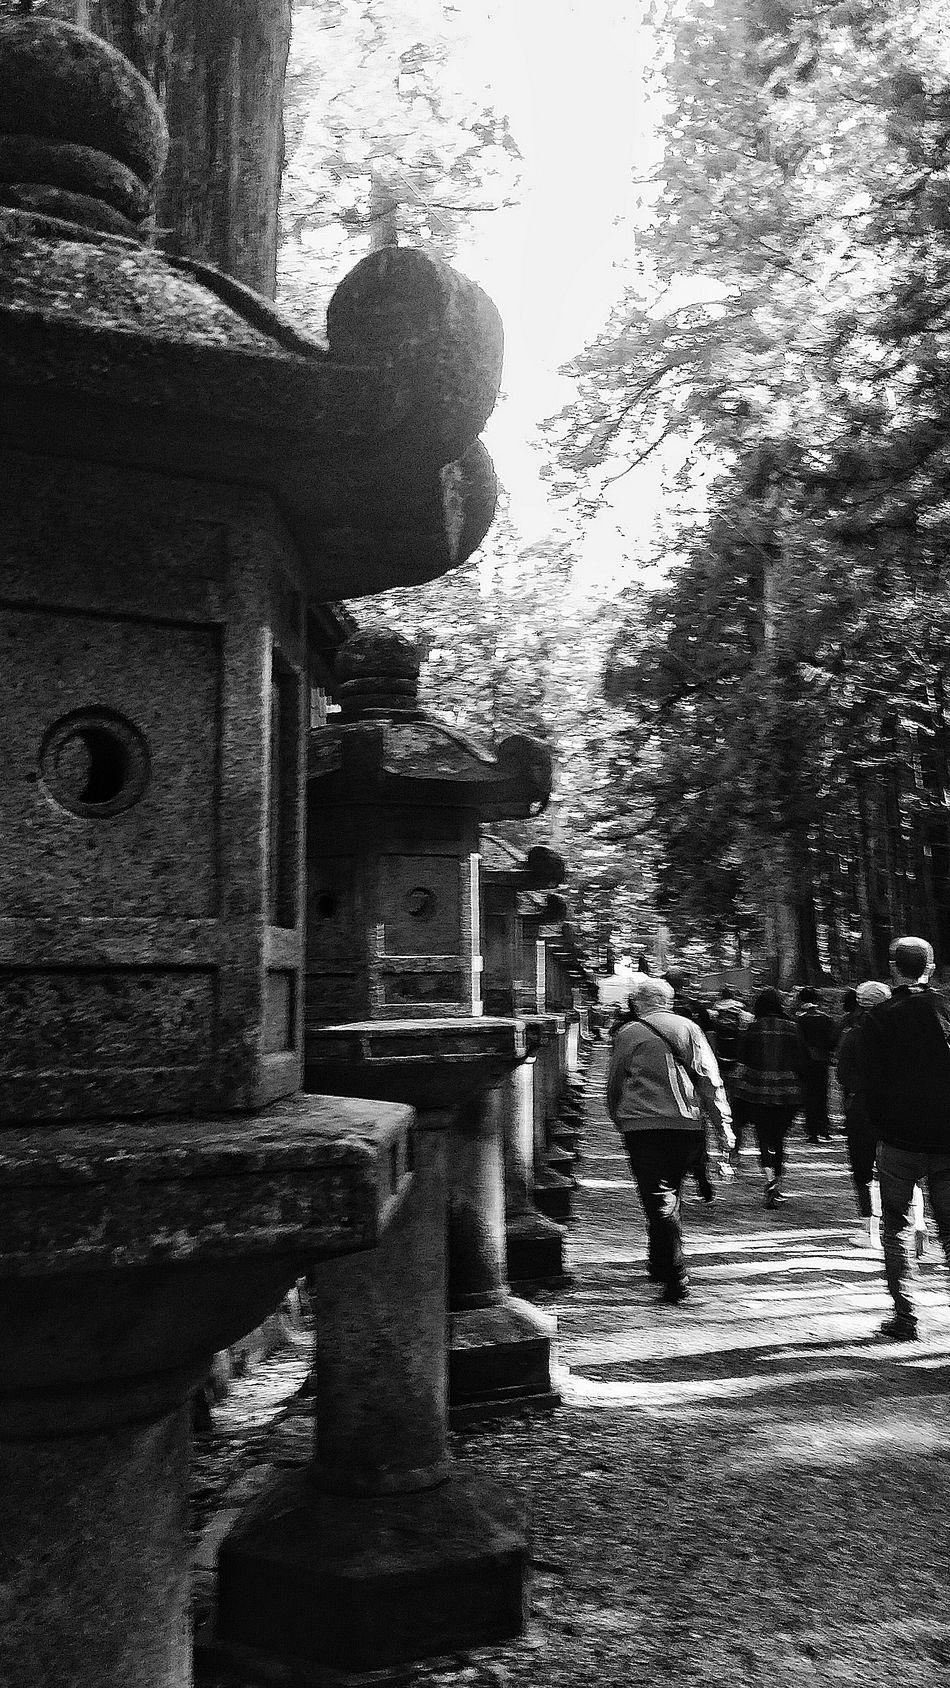 Stone Lanterns Lined Up Toshogu Shrine Nikko Tochigi Prefecture Autumn Japanautumn2015 Bnw Bnwphotography Bnwcollection Bnw_captures Bnw_japan Bnw_streetphotography Japan Travelphotography Streetphotography